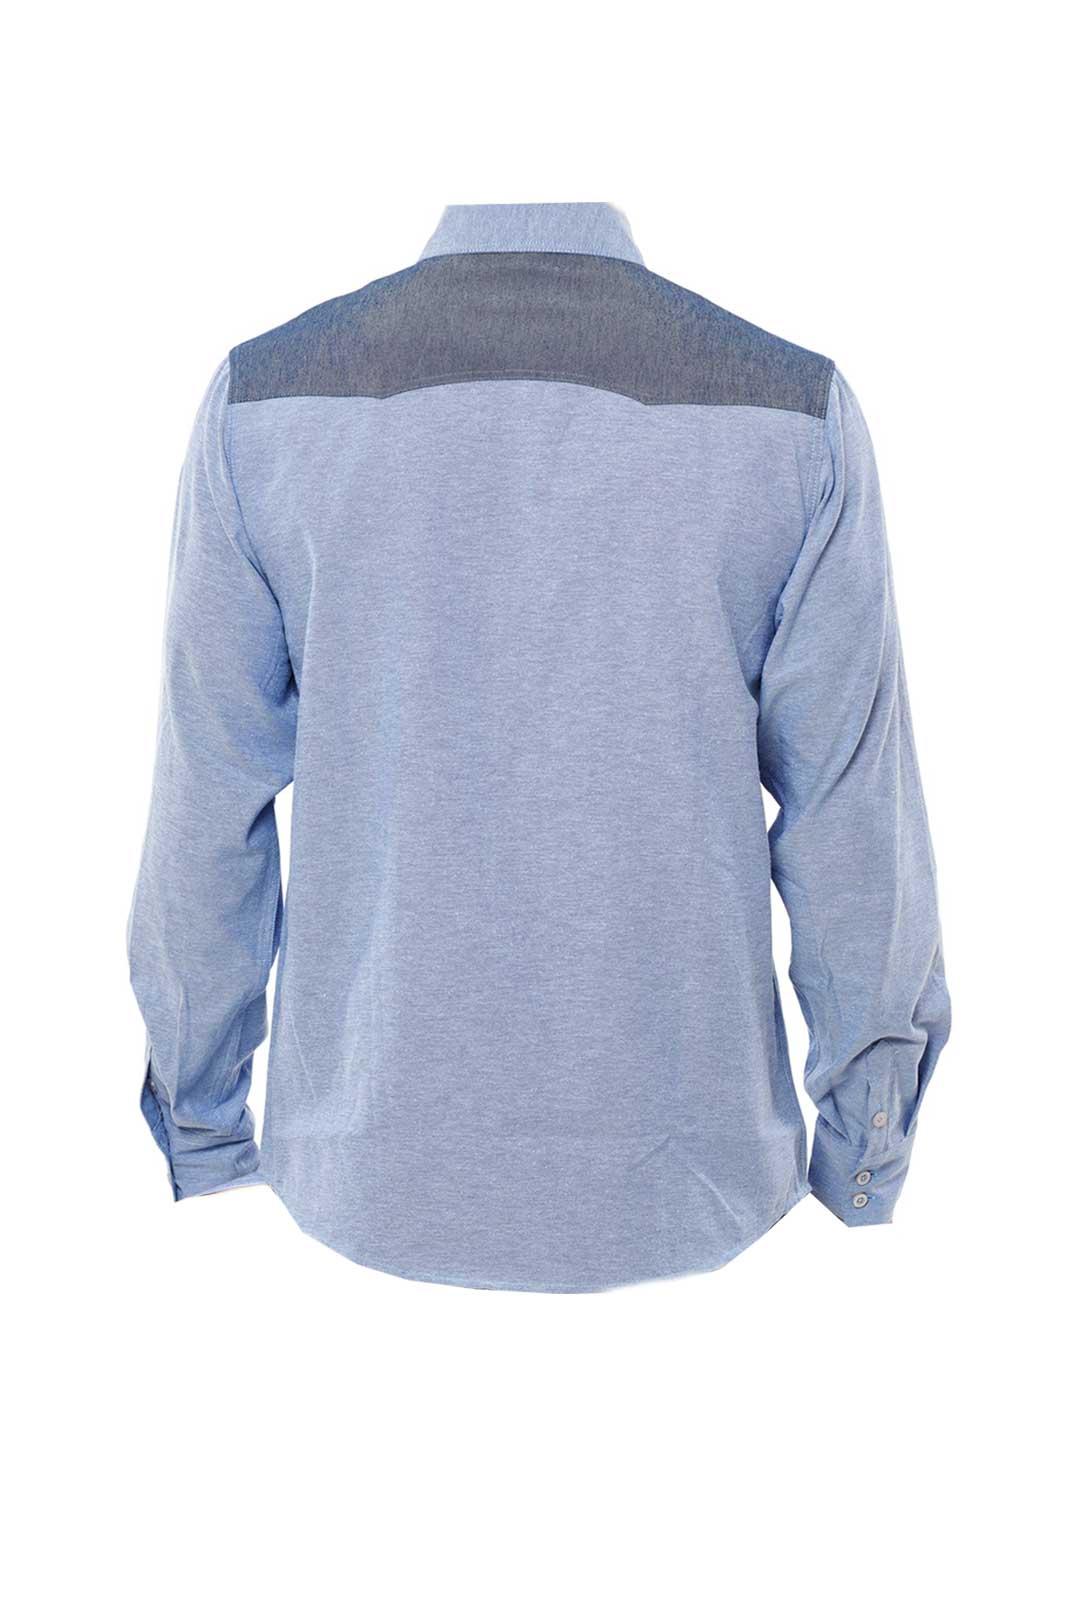 0f51990ebe6f Köp De Palma: Racing the Street Shirt Blue (599 kr) hos Shock [Fri ...